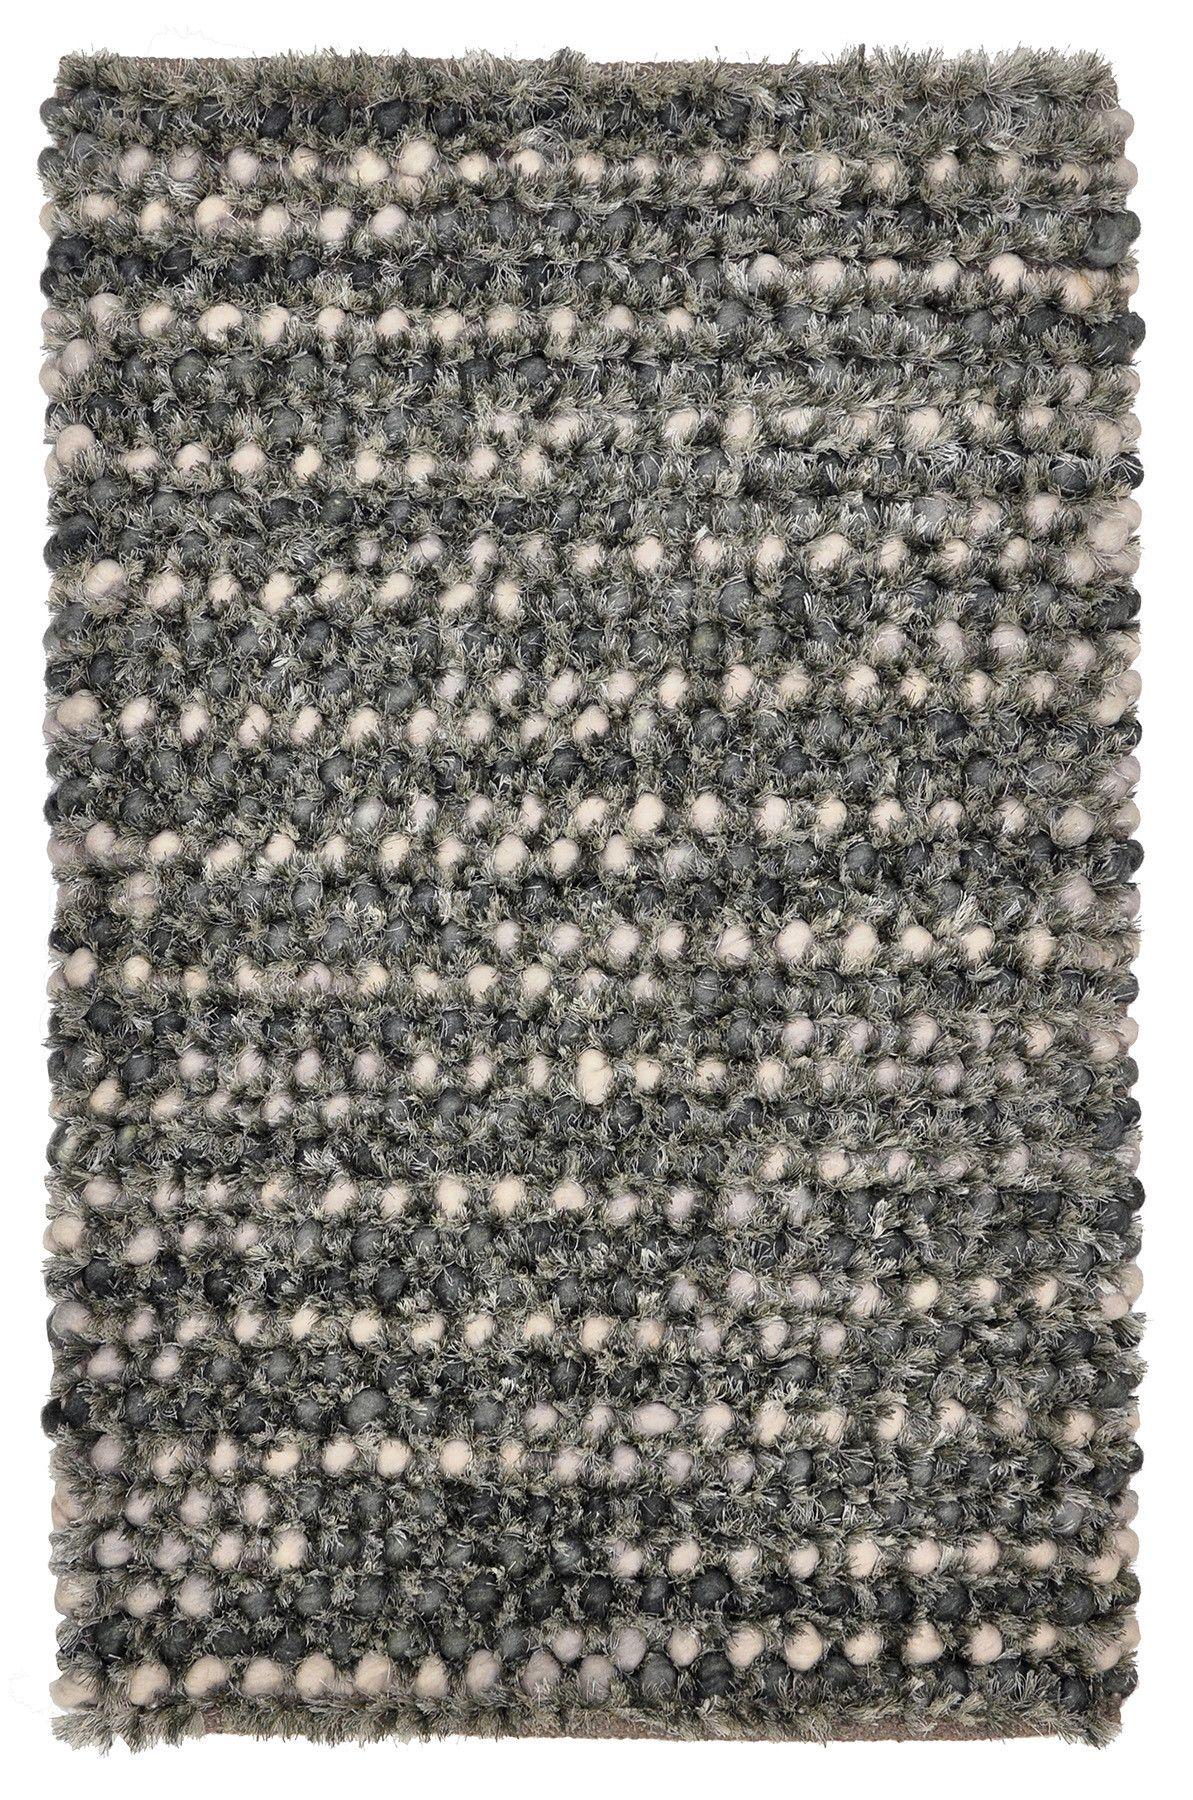 Kosas Home Caillou Shag Grey Area Rug Grey area rug